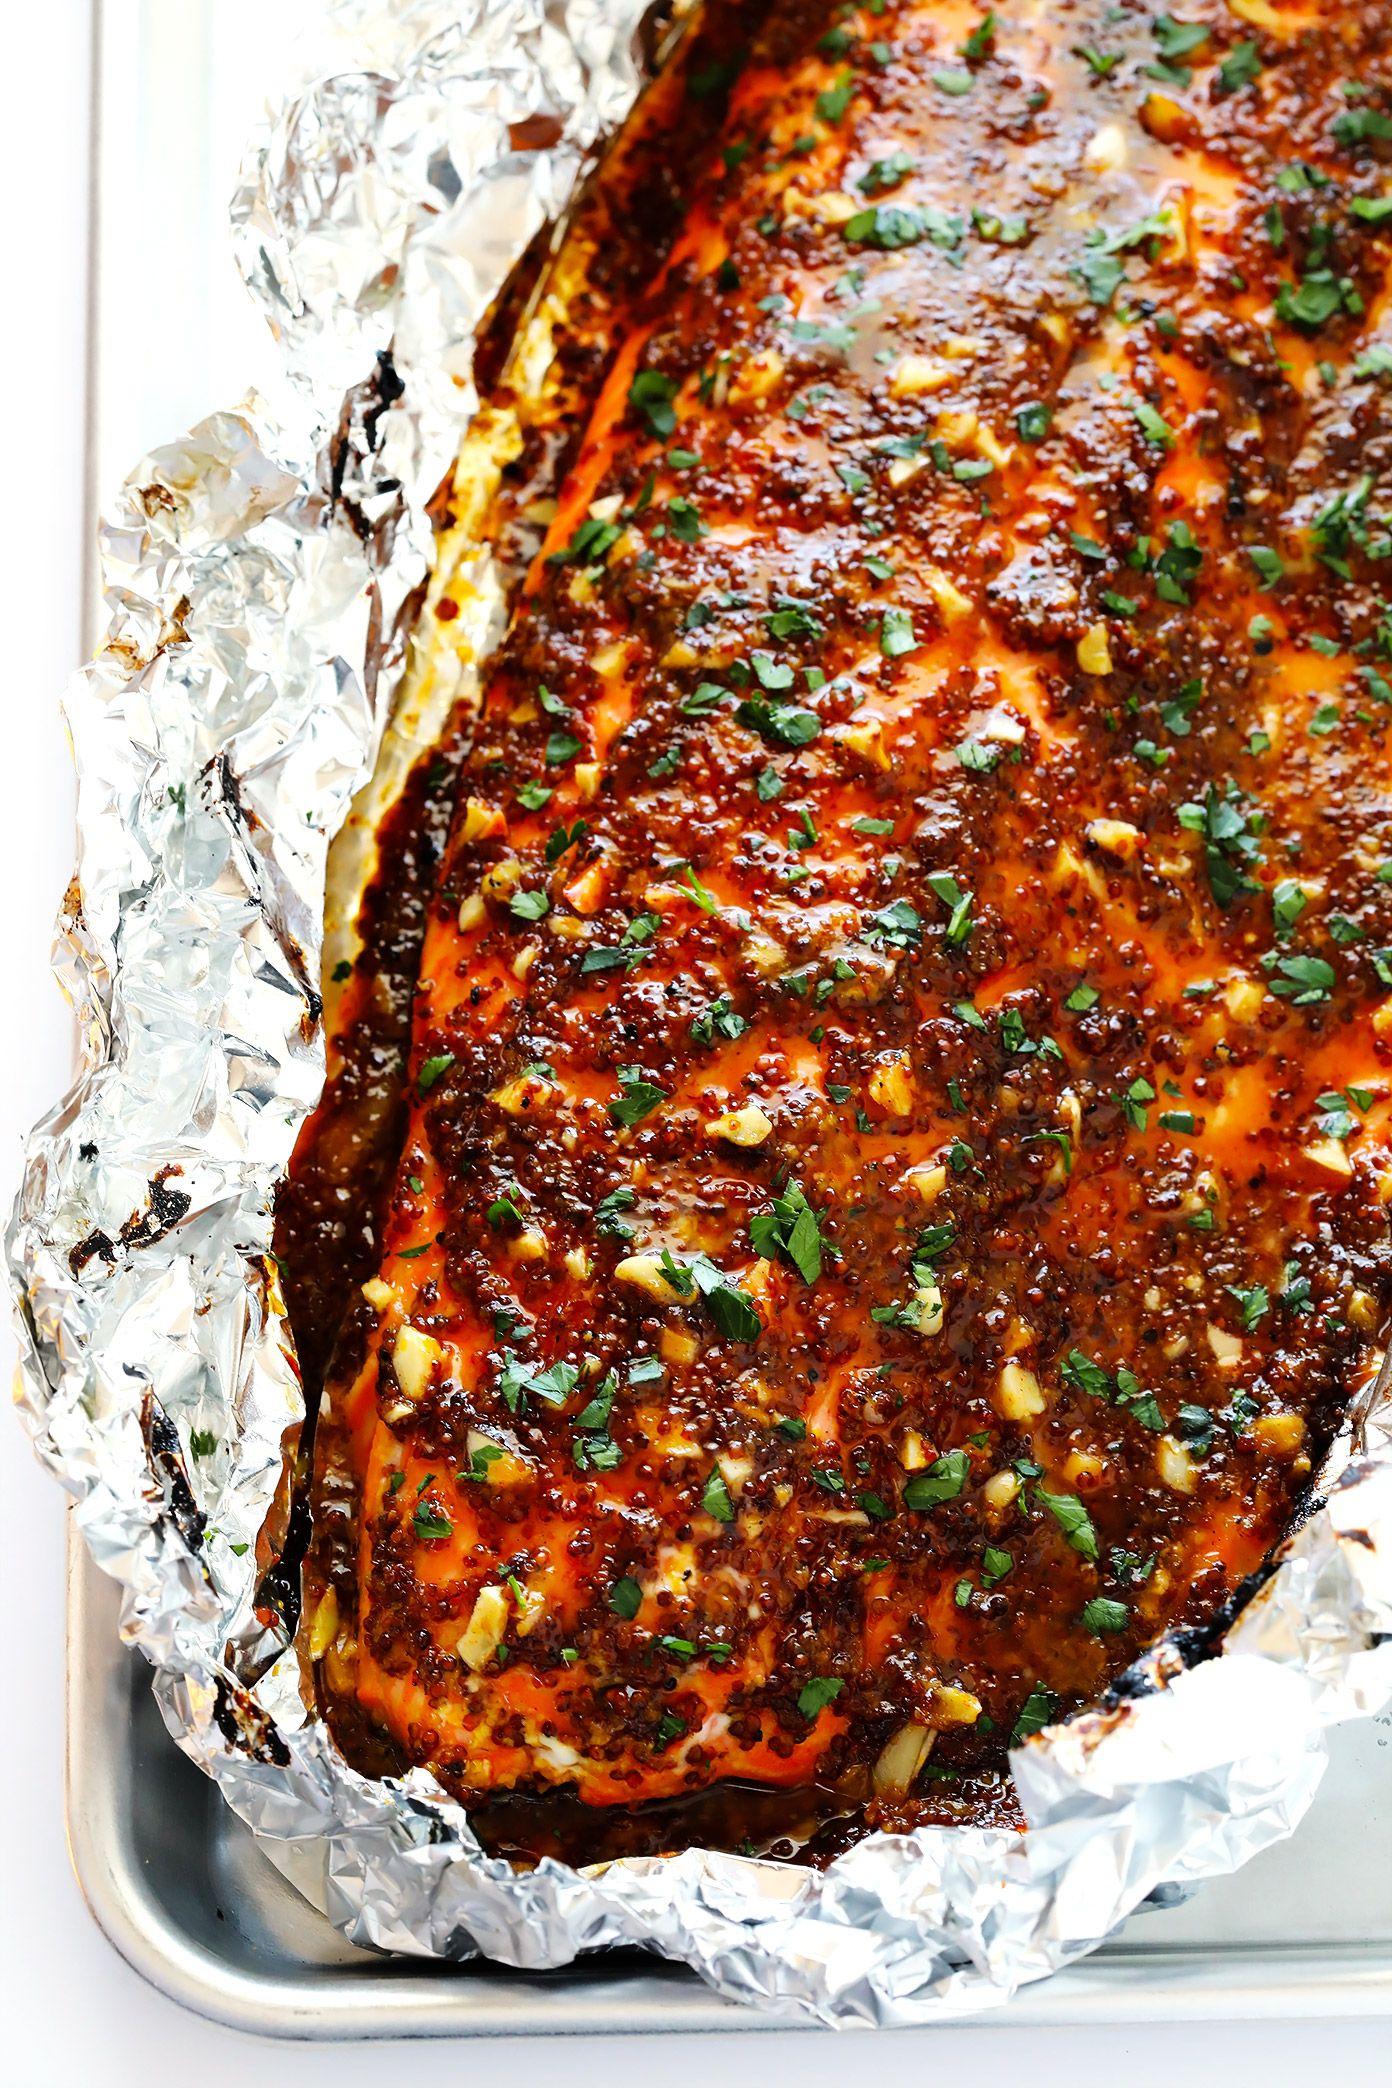 Honey Mustard Salmon In Foil Recipe Baked Salmon Recipes Honey Mustard Salmon Mustard Salmon